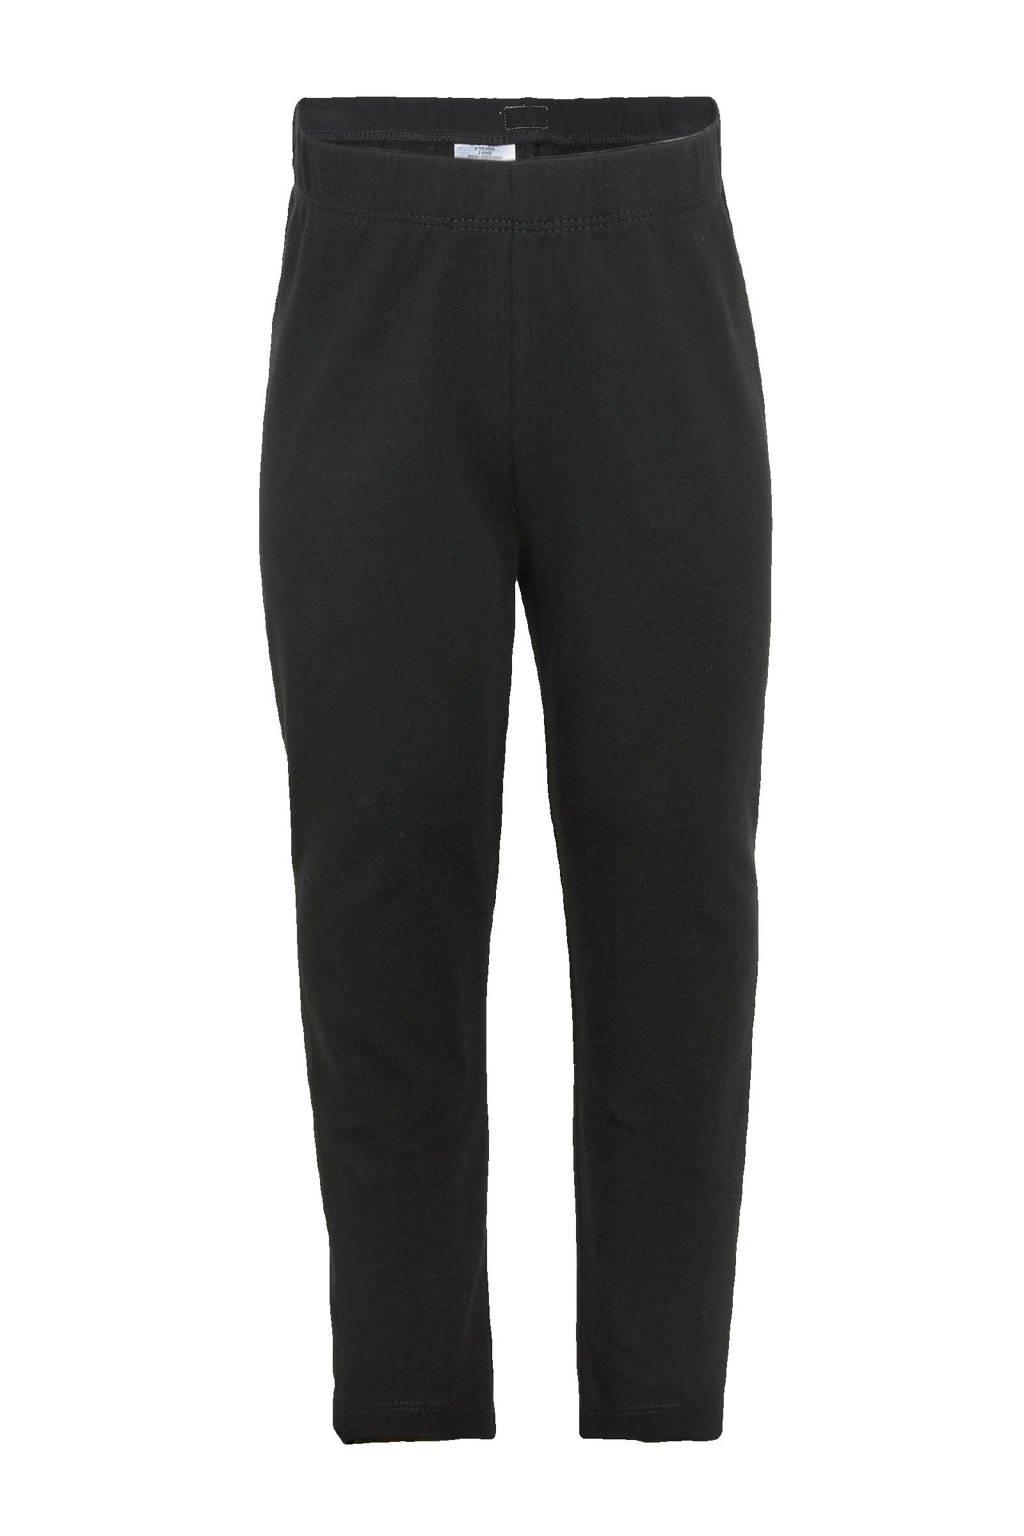 GAP legging zwart, Zwart